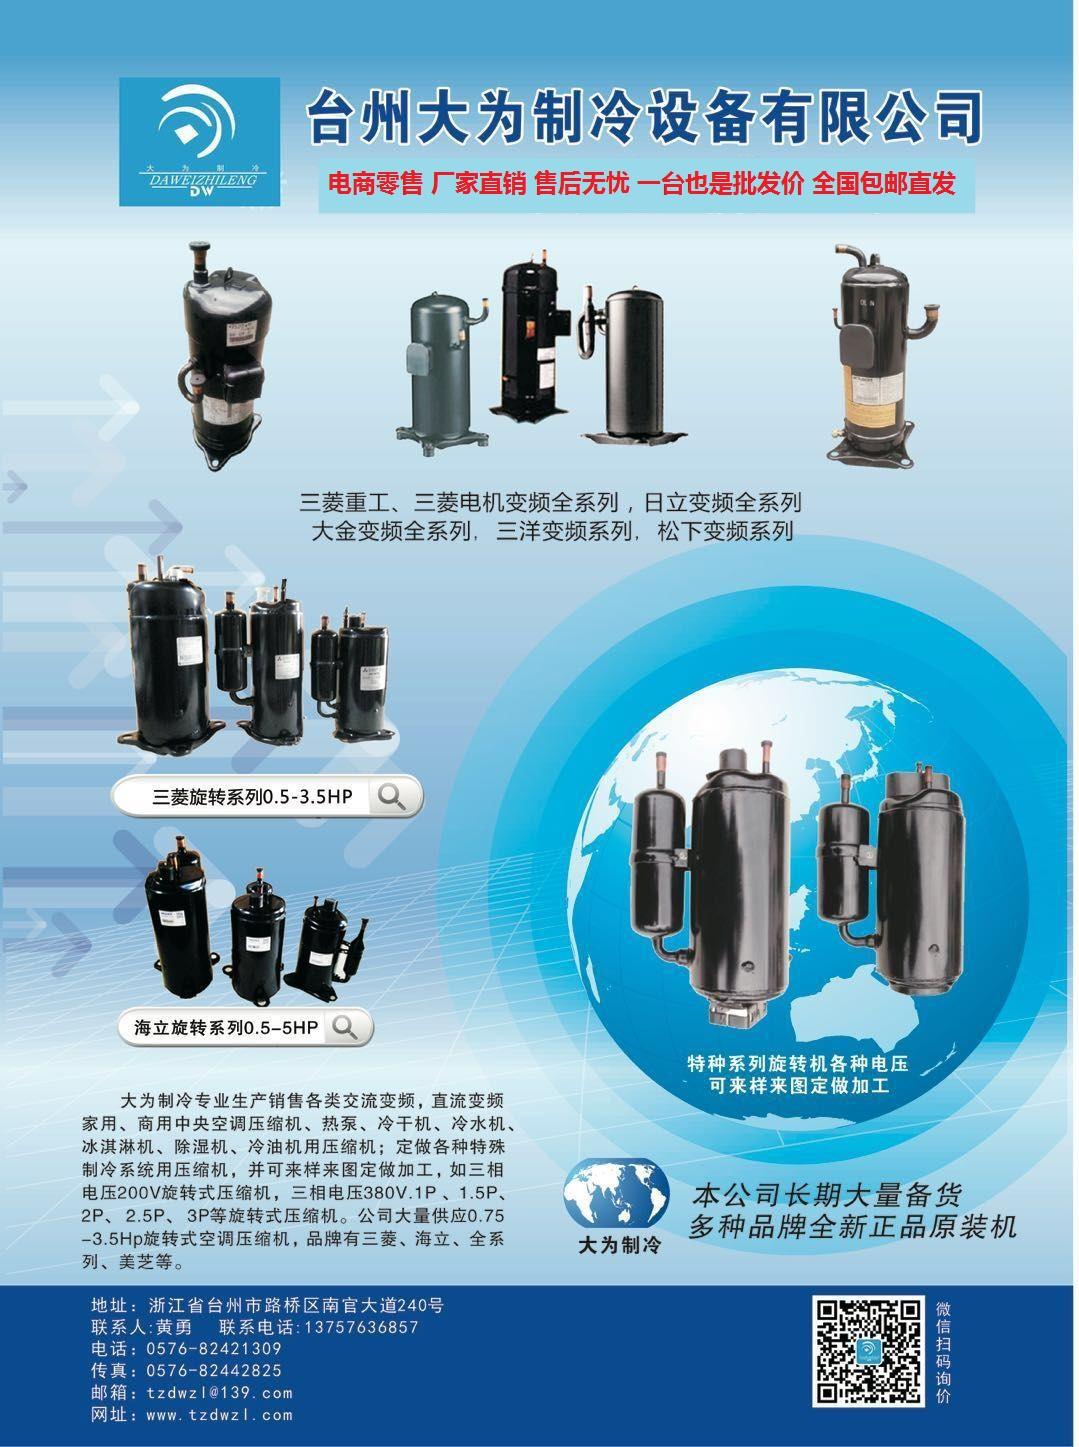 2YC63RXD   大金直流变频压缩机